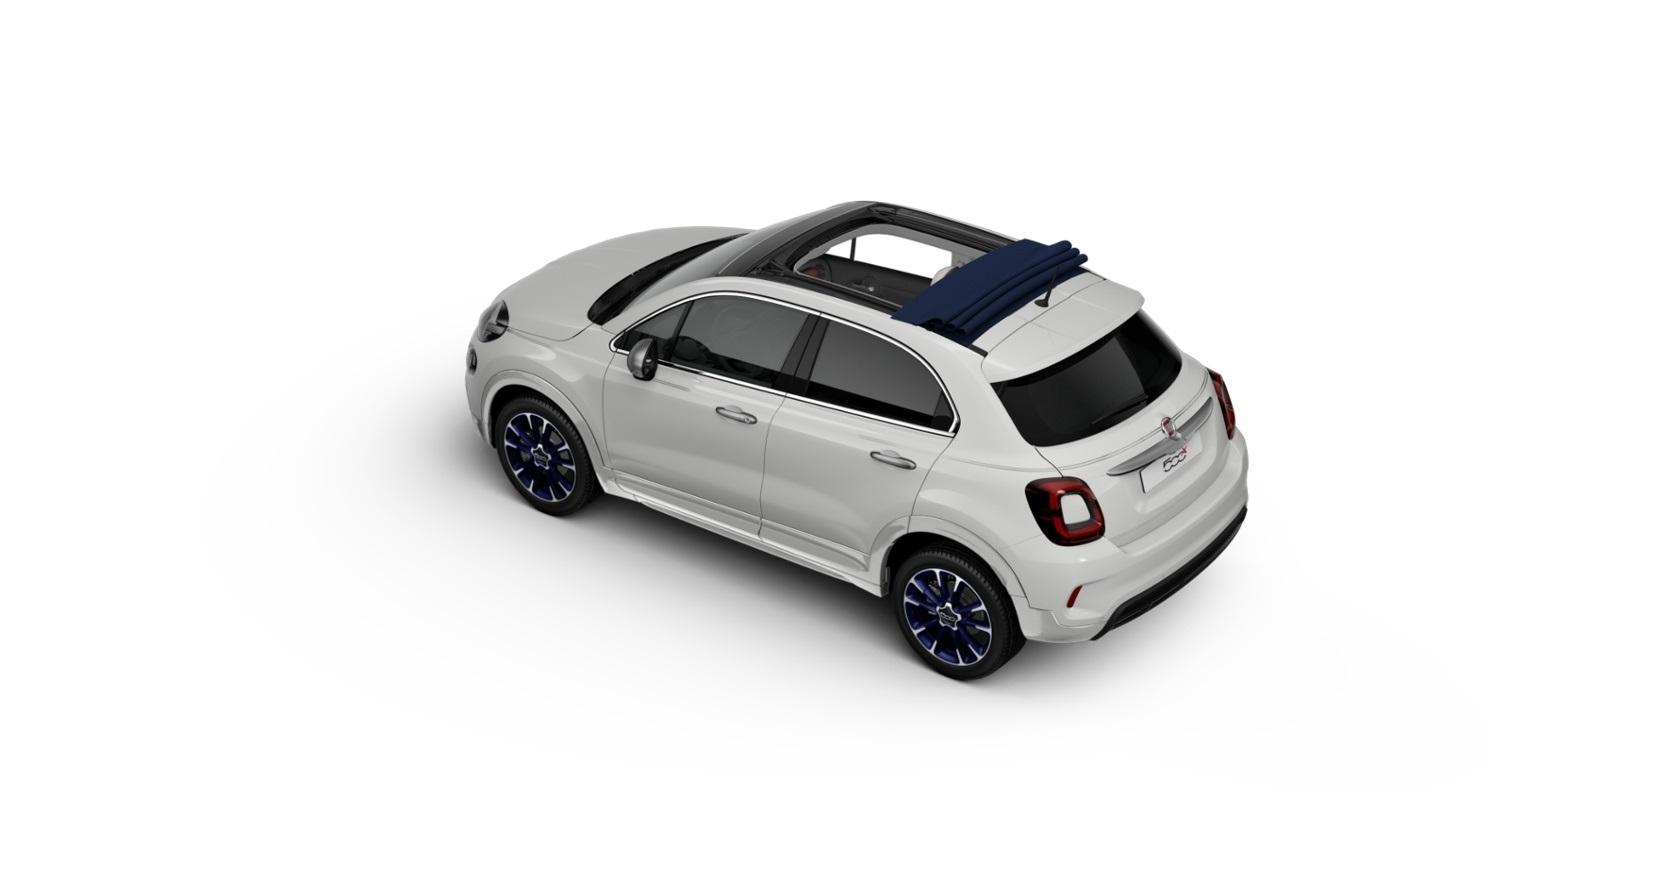 Fiat 500X Dolce Vita Launch Edition